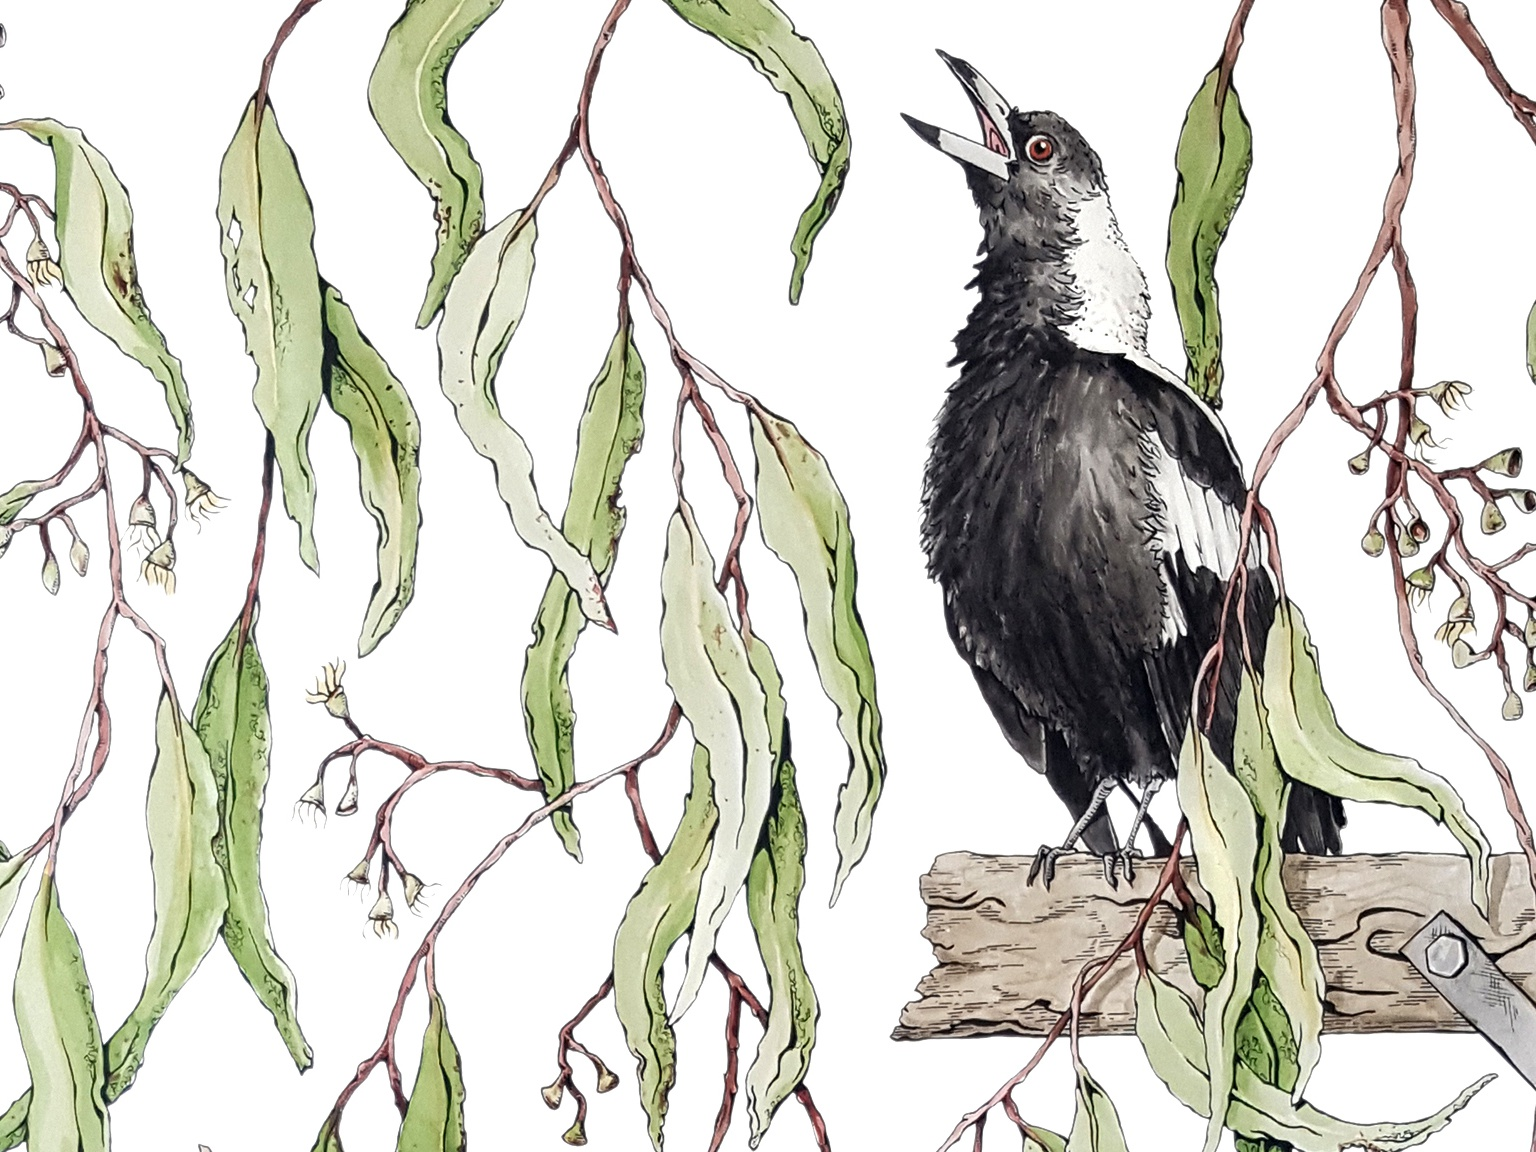 The Morning Report morning magpie botanical illustration nature illustration fine art artwork plant tree wildlife bird nature drawing illustrator watercolor gouache australia illustration